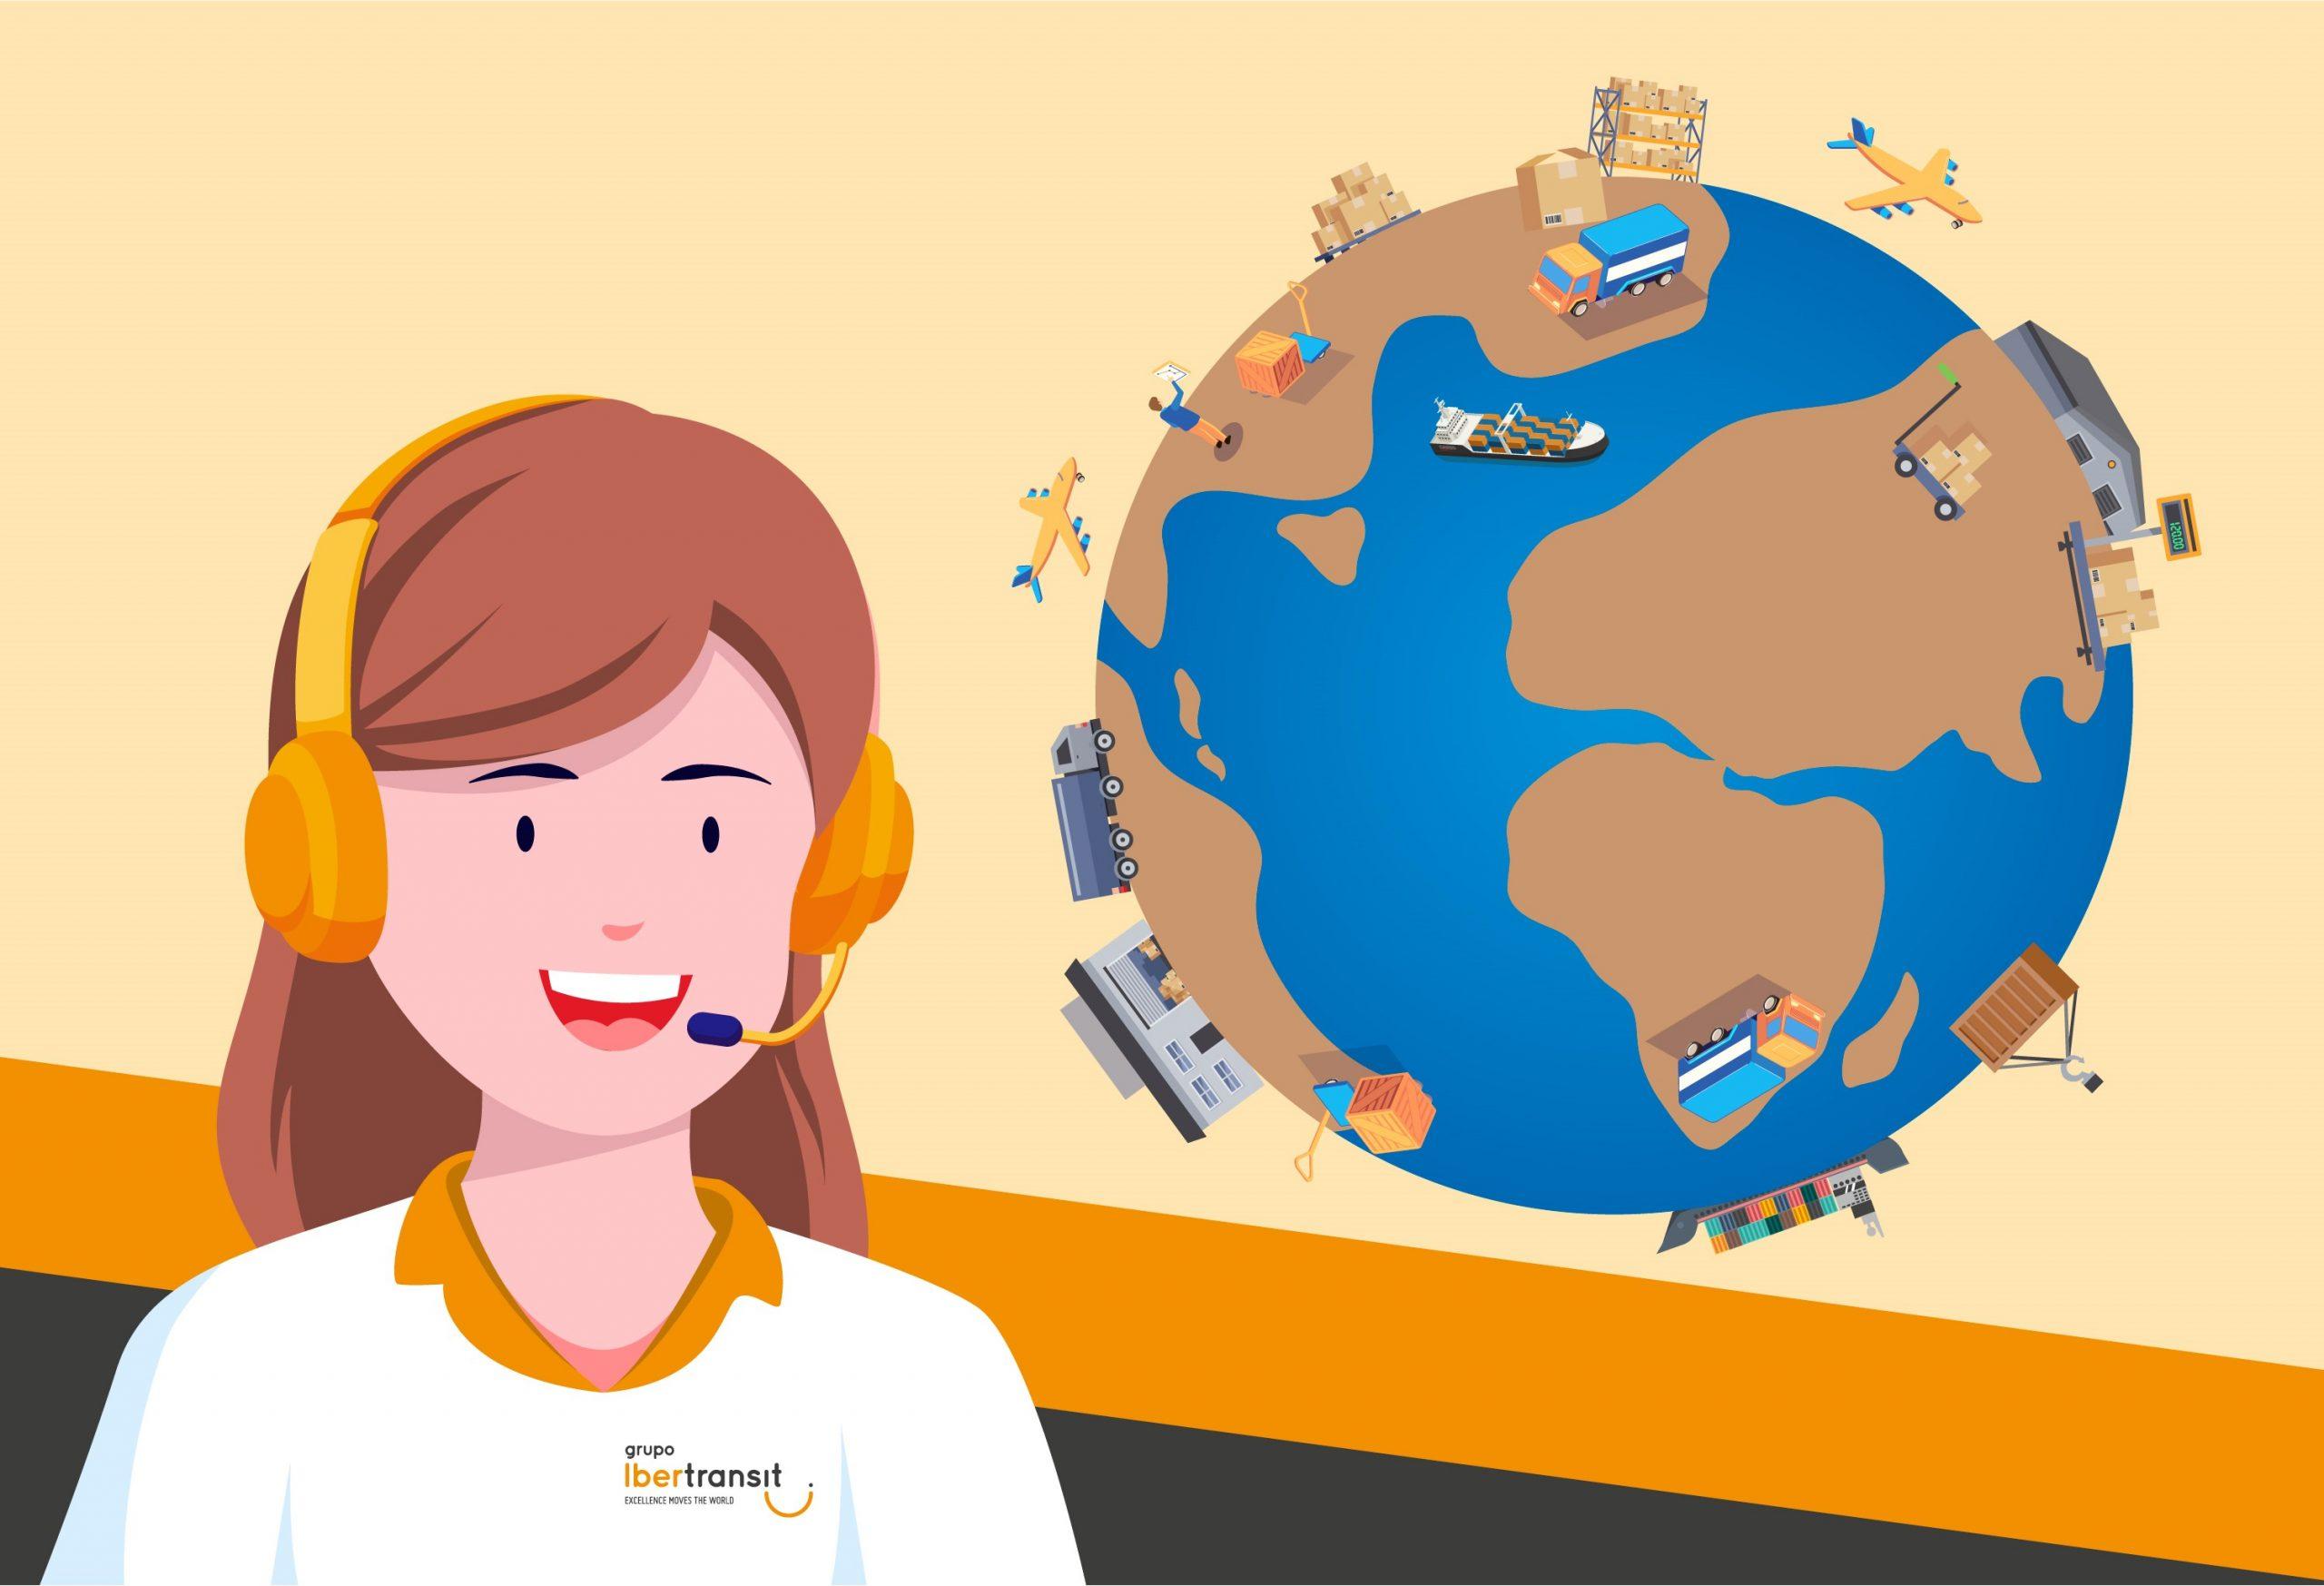 Contrata un transitario para exportarContrata un transitario para exportar con éxito